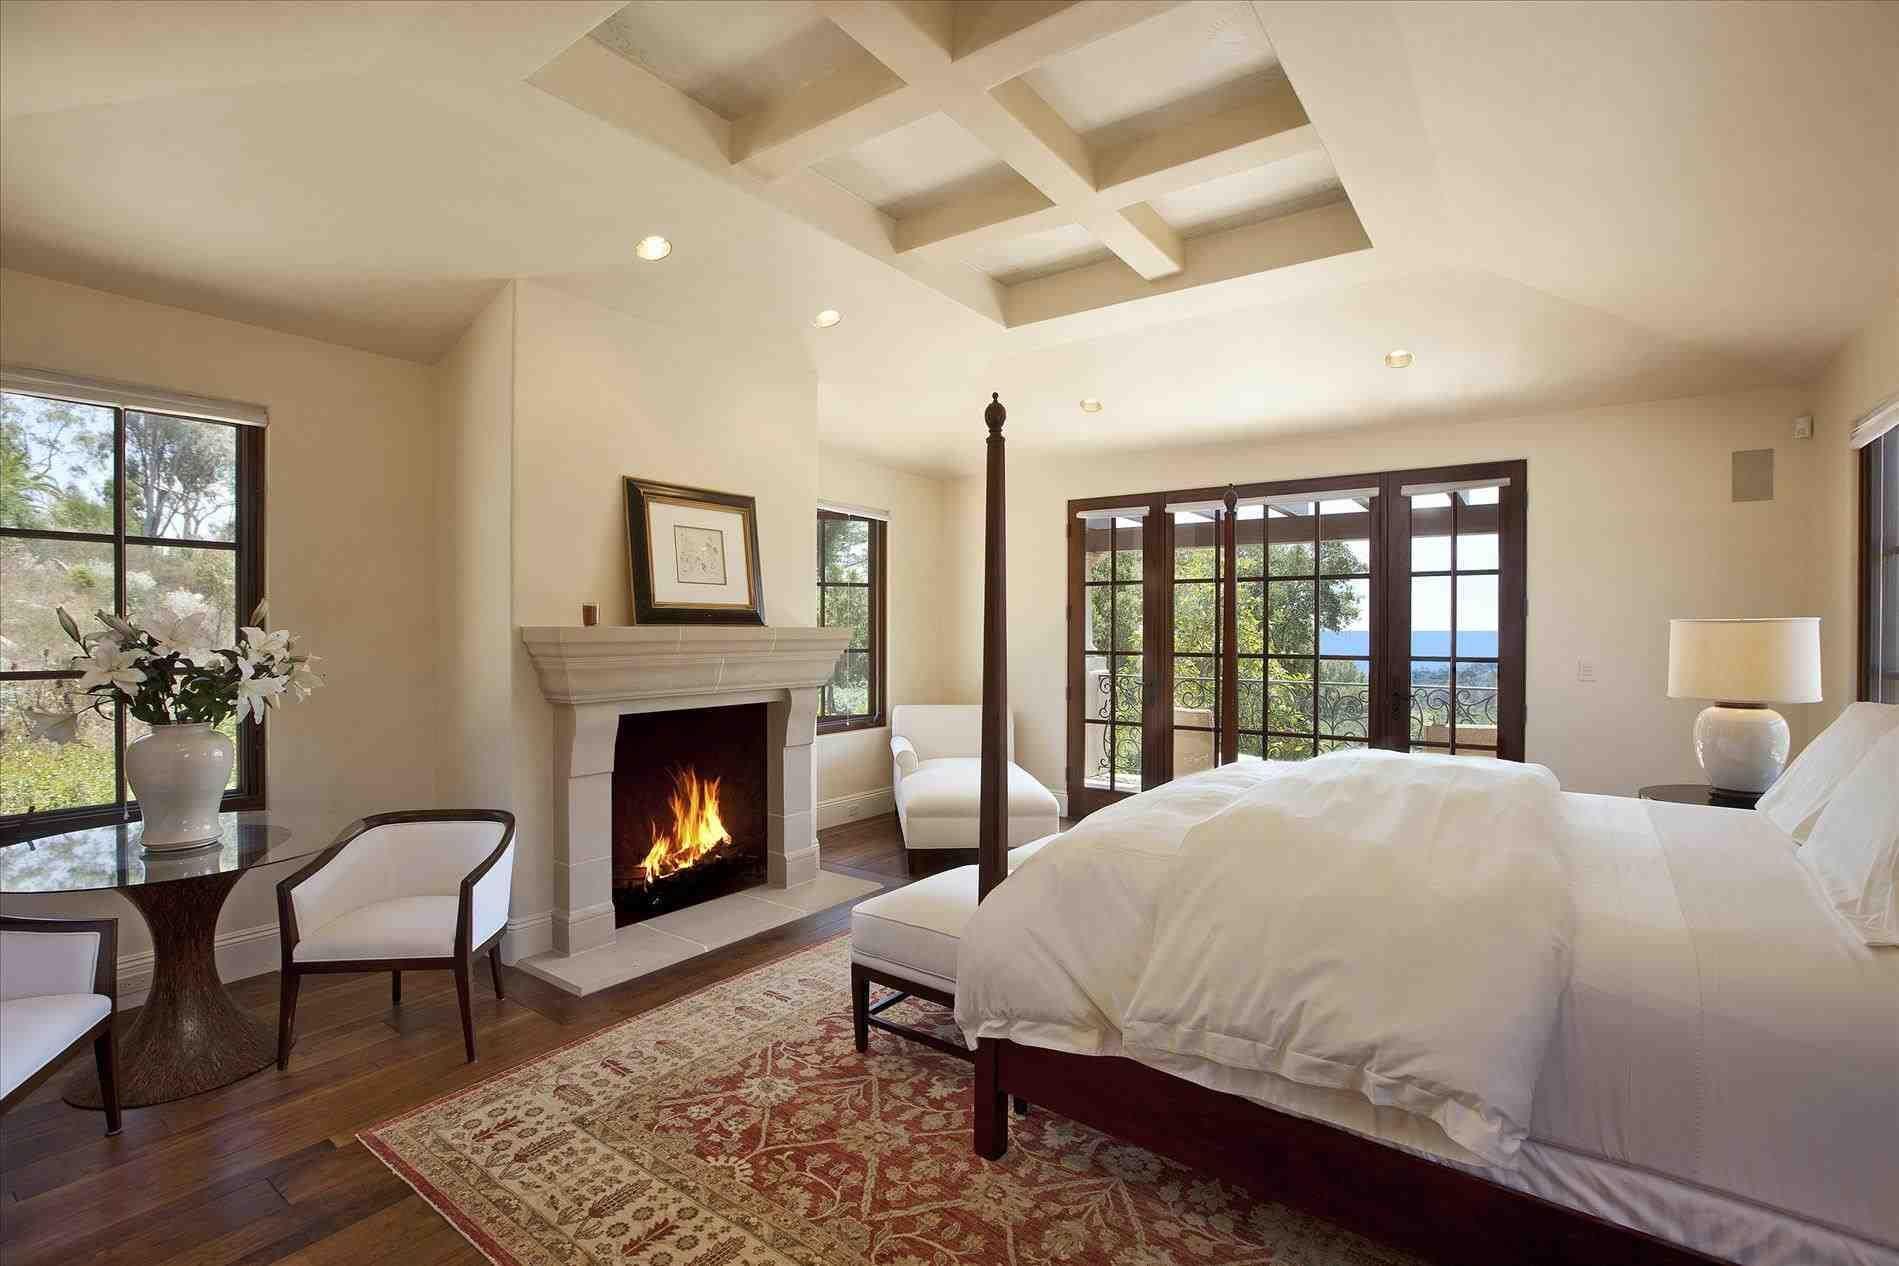 Home Interior Design Aloininfo Classy Style Decor Designing Classy Spanish  Hacienda Interior Design Spanish Style Home